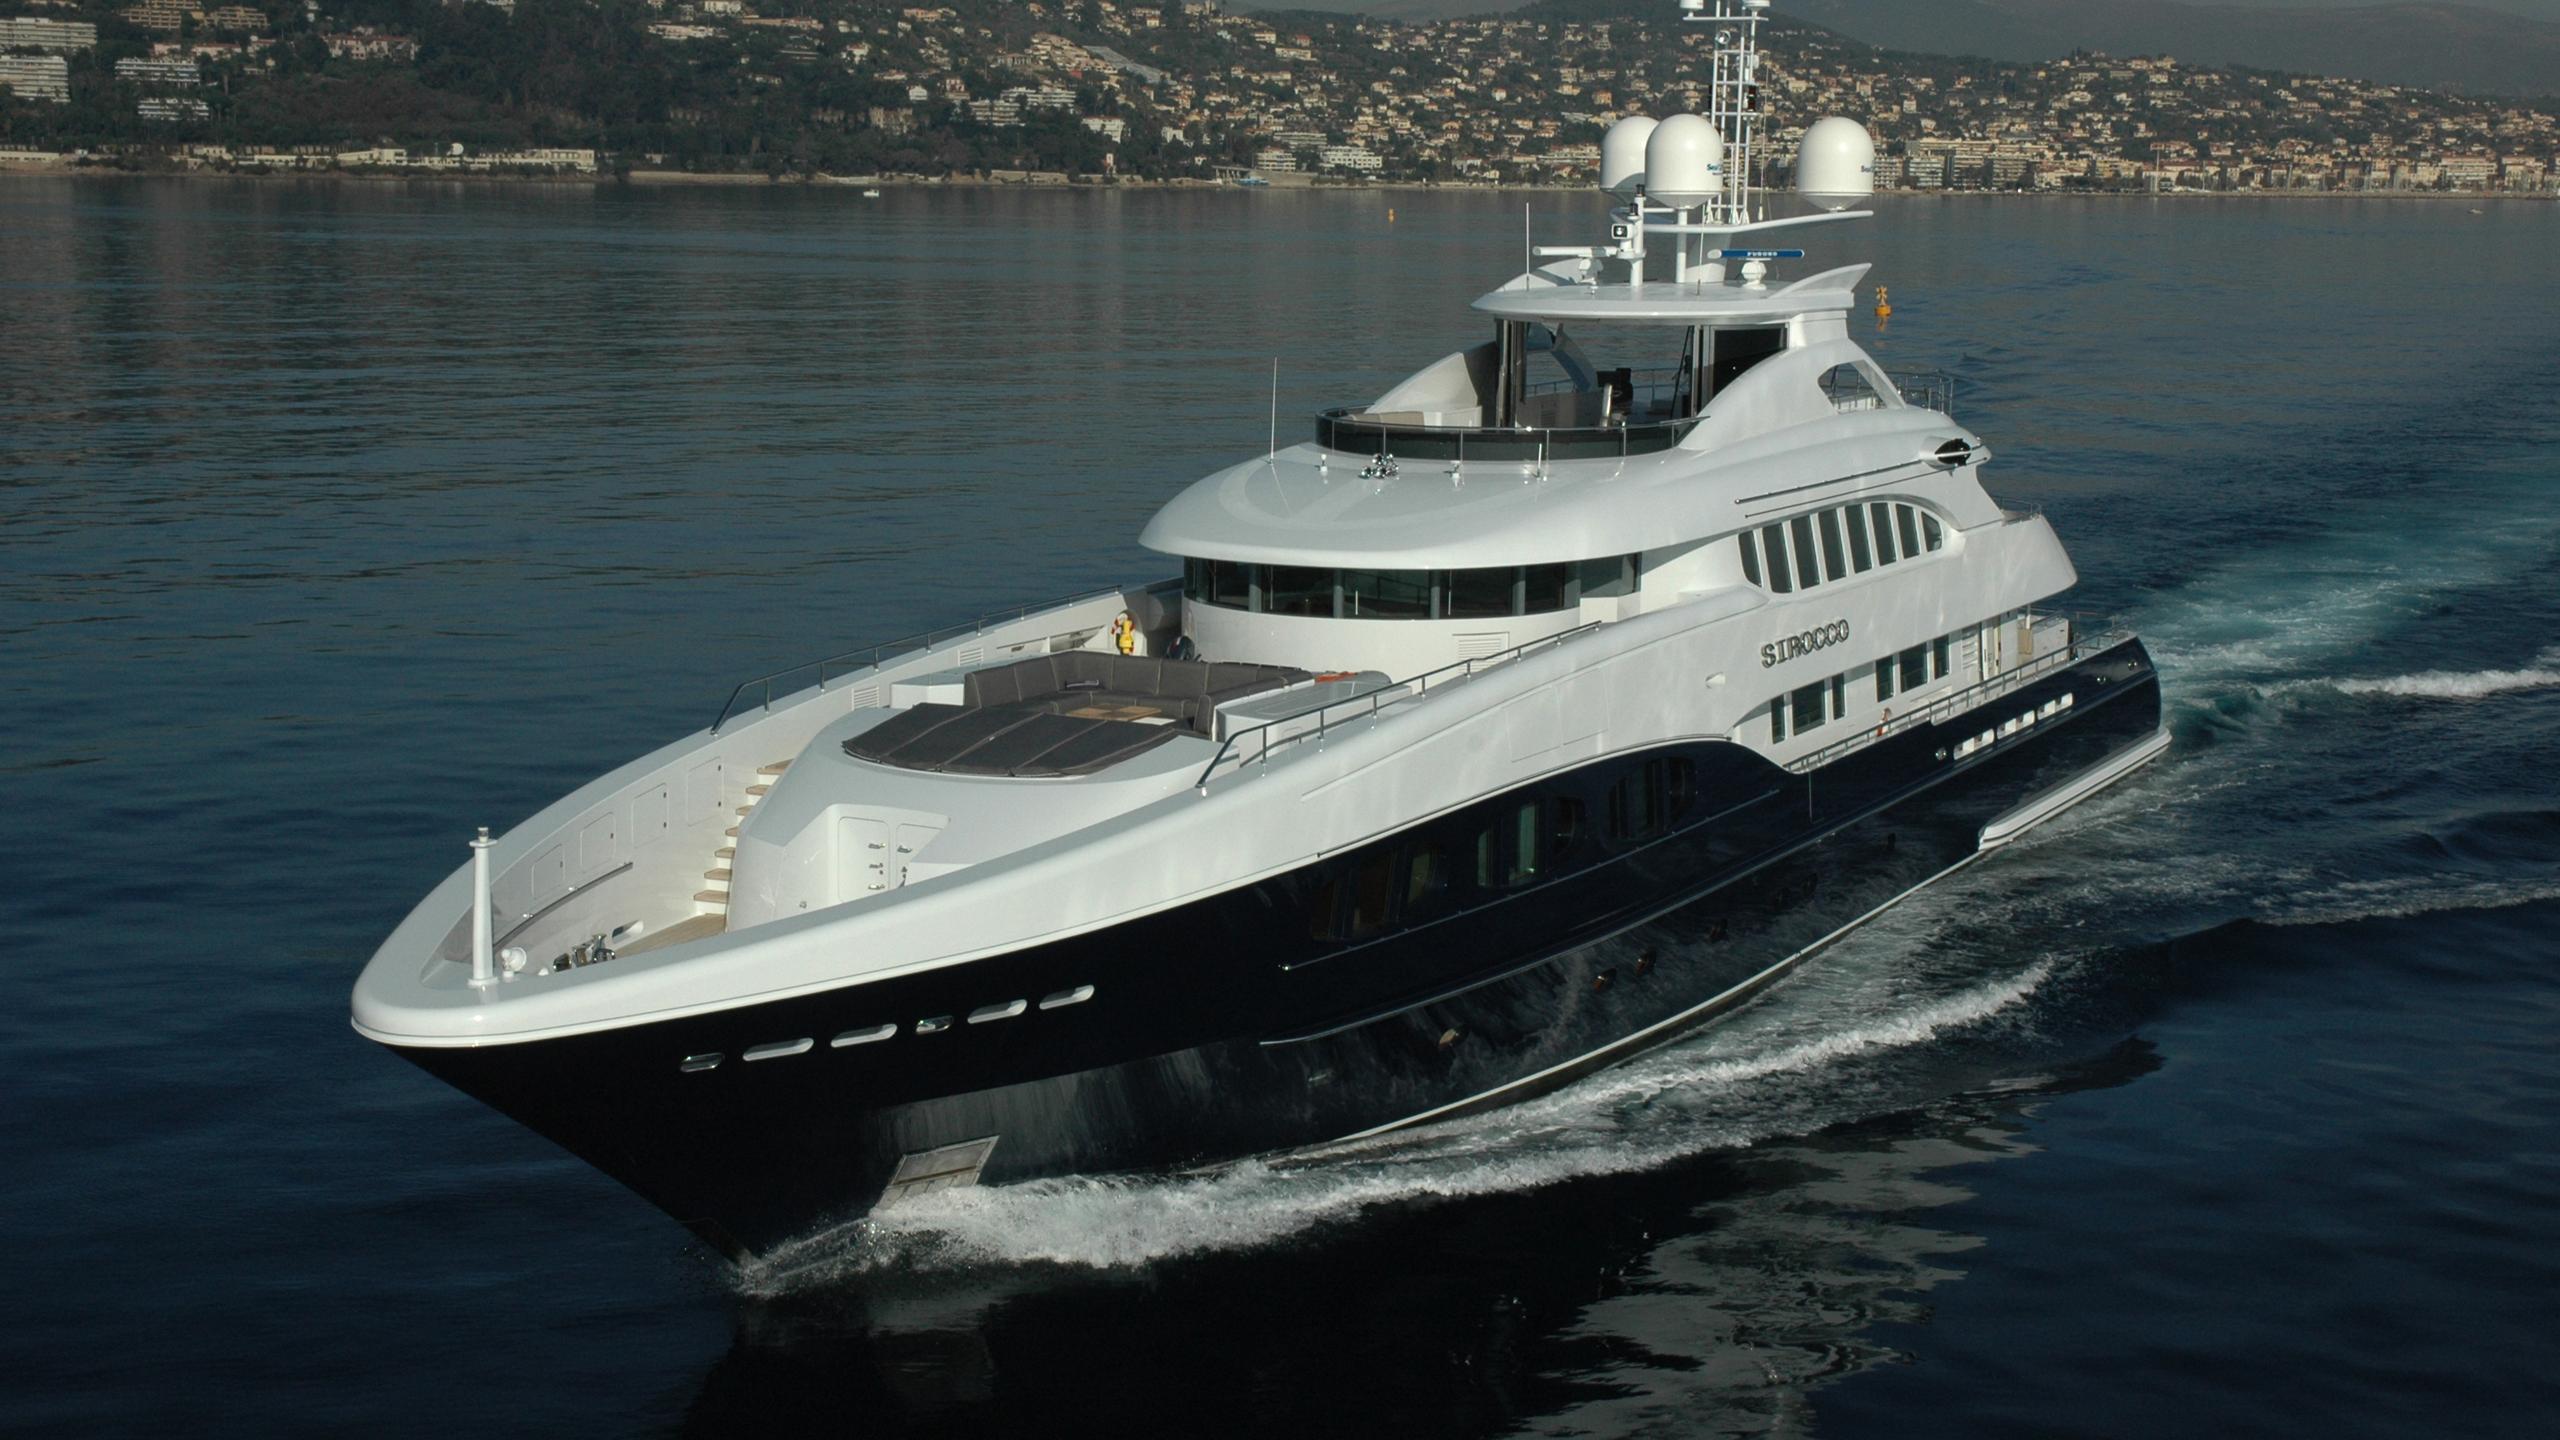 sirocco-yacht-for-sale-cruising